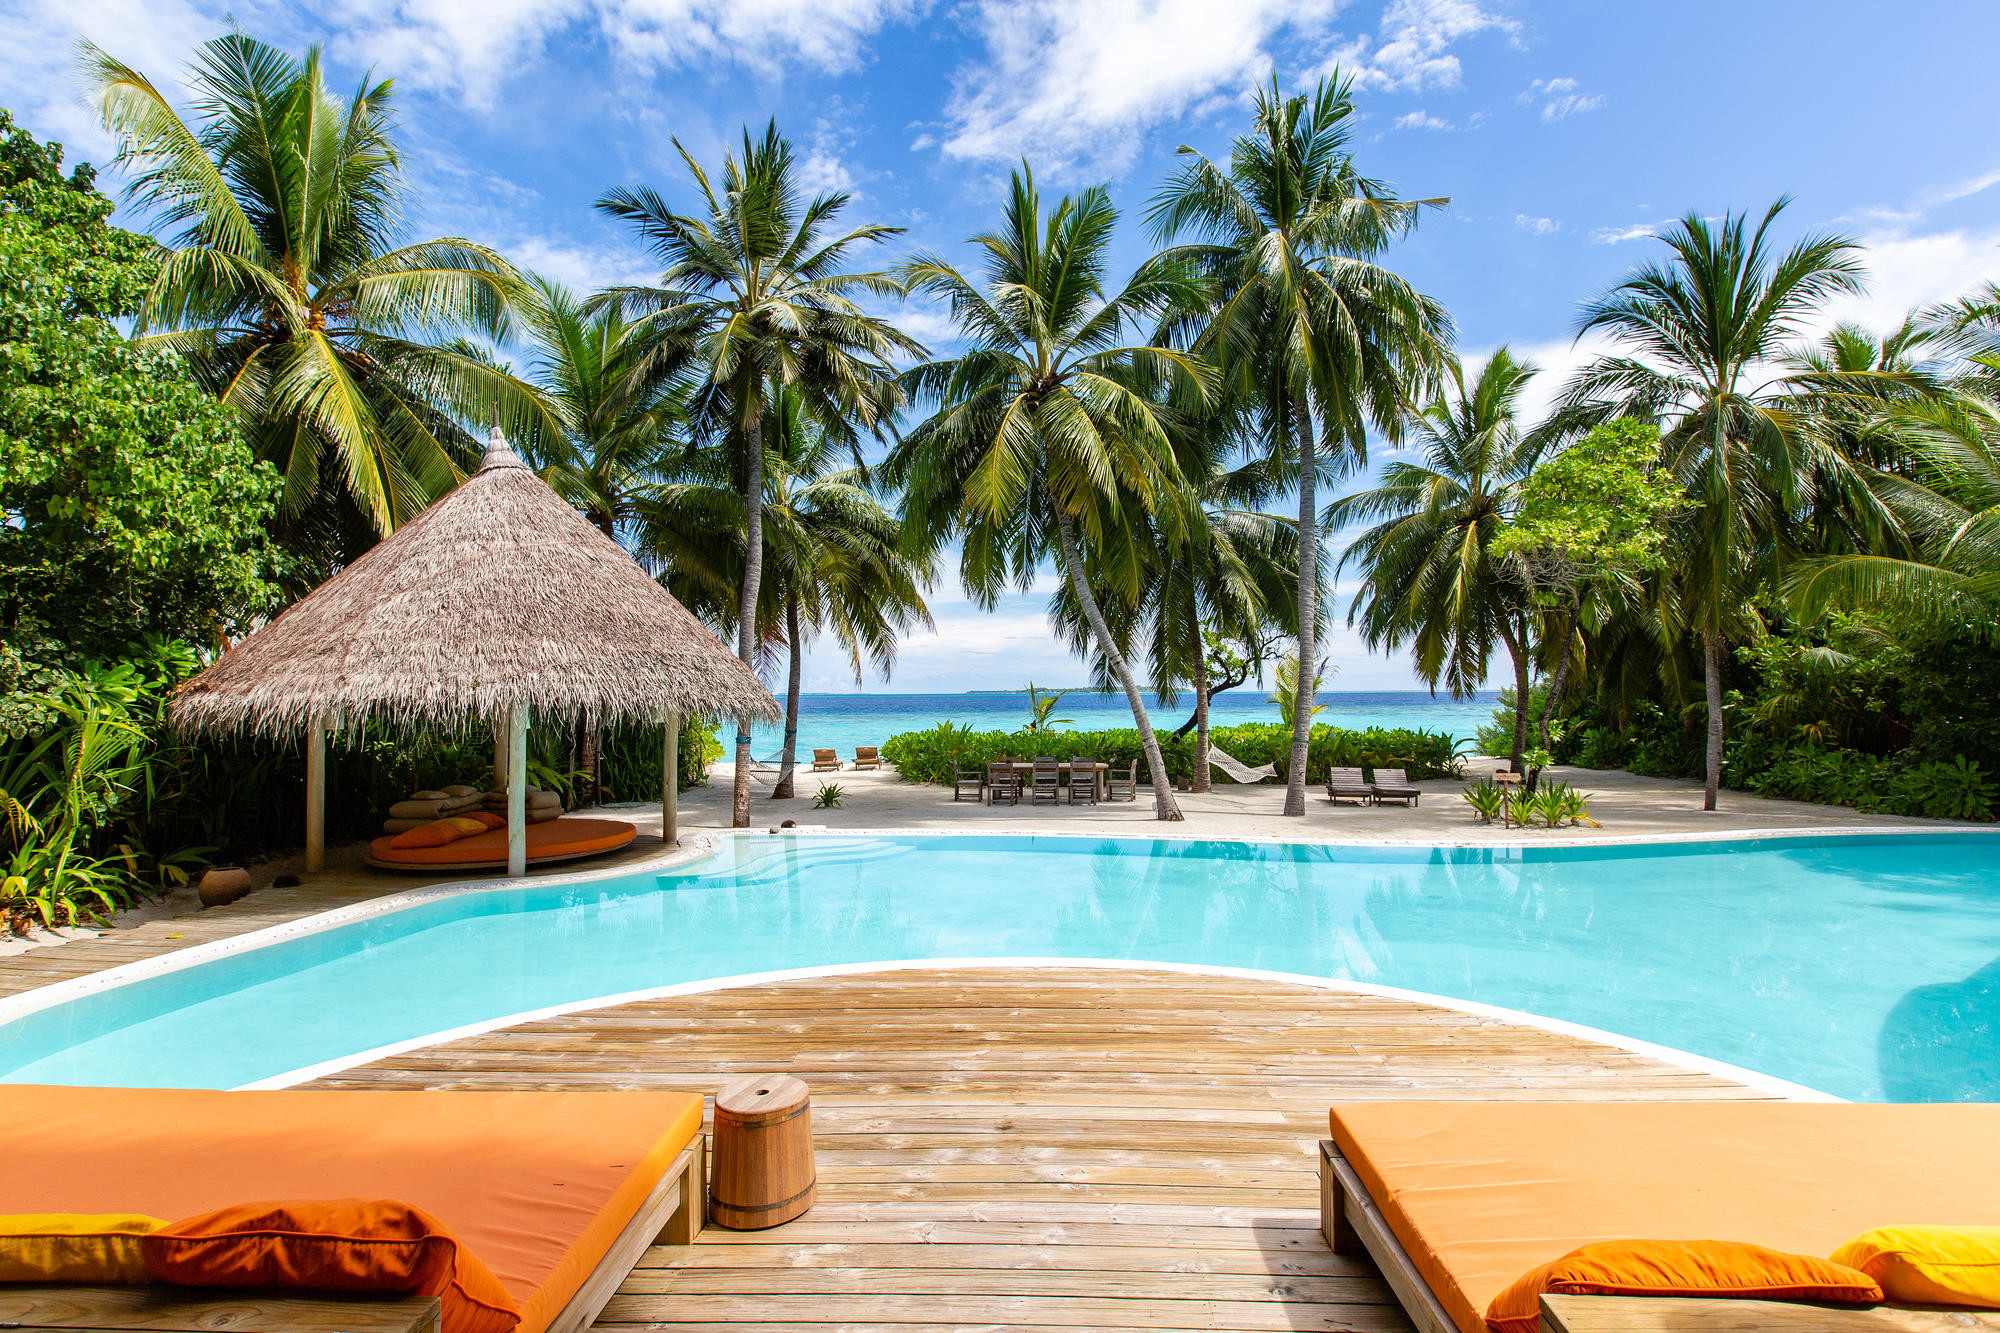 The view from Villa 15 at Soneva Fushi in The Maldives